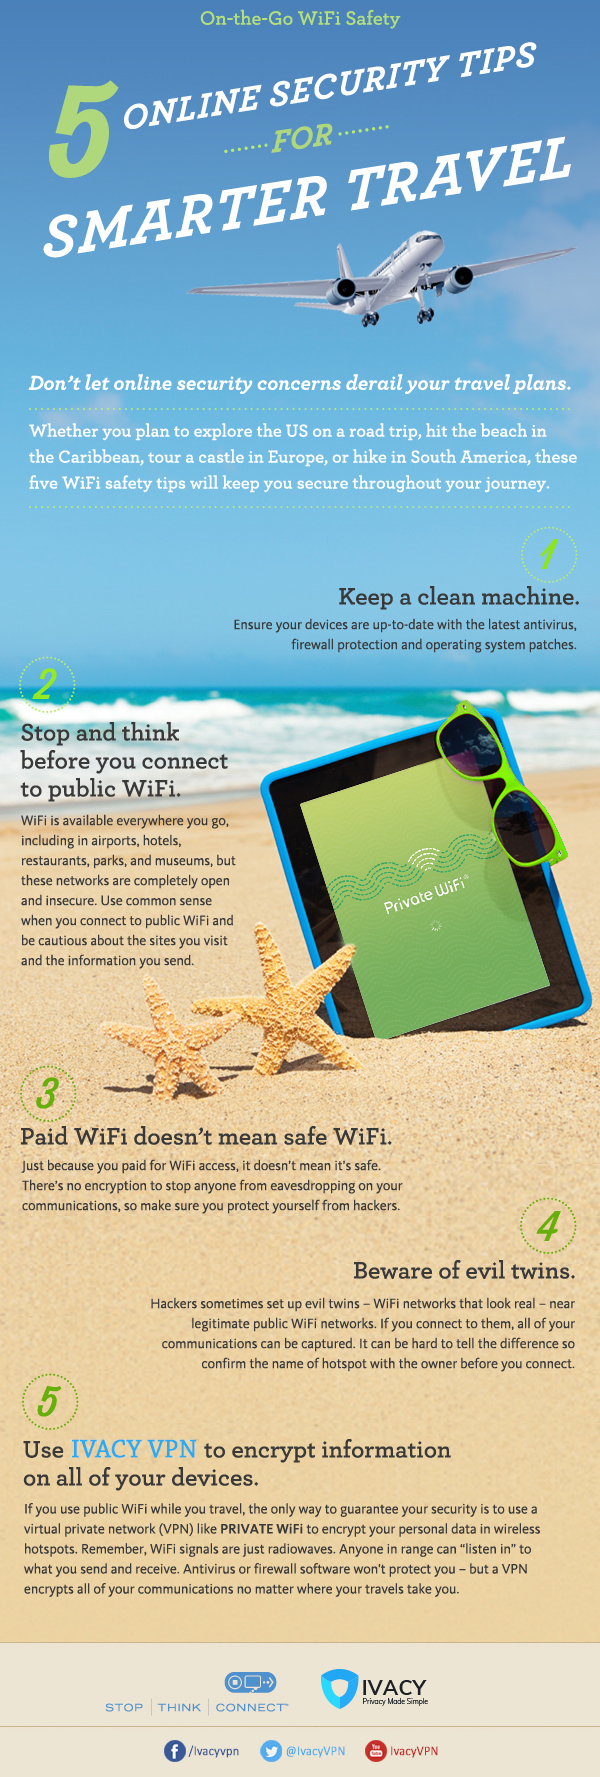 Safer Internet Day tips